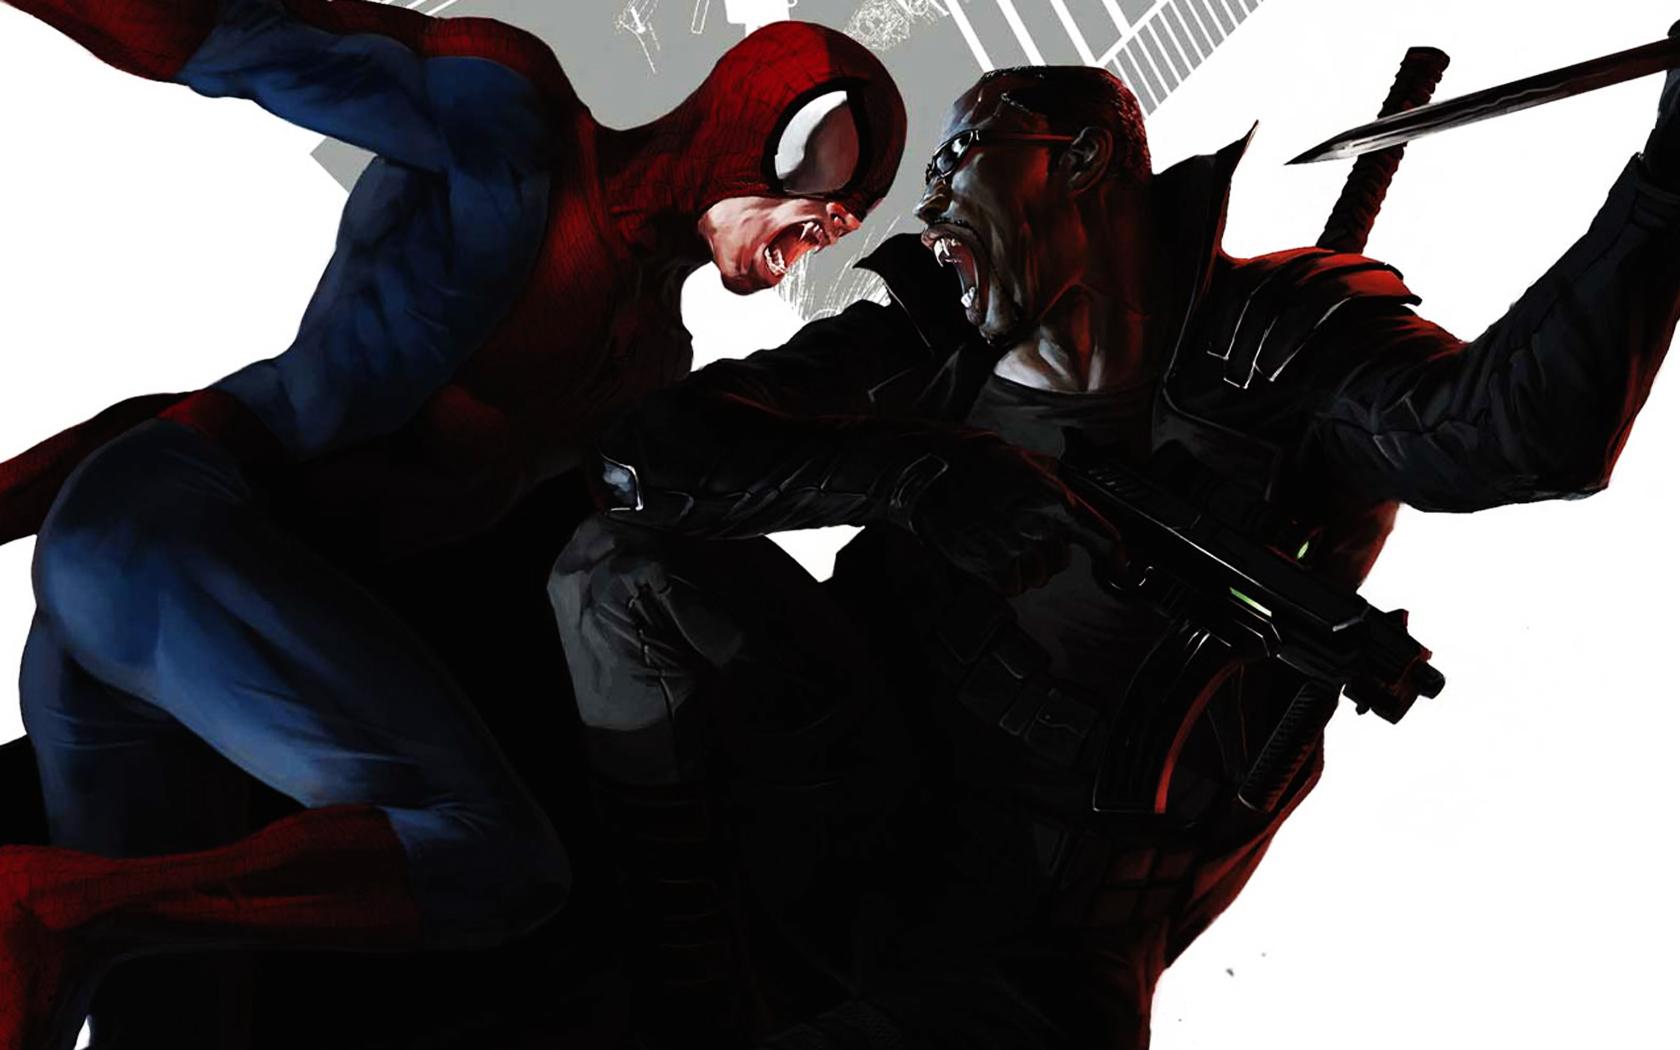 Spider Man Noir Wallpaper - WallpaperSafari